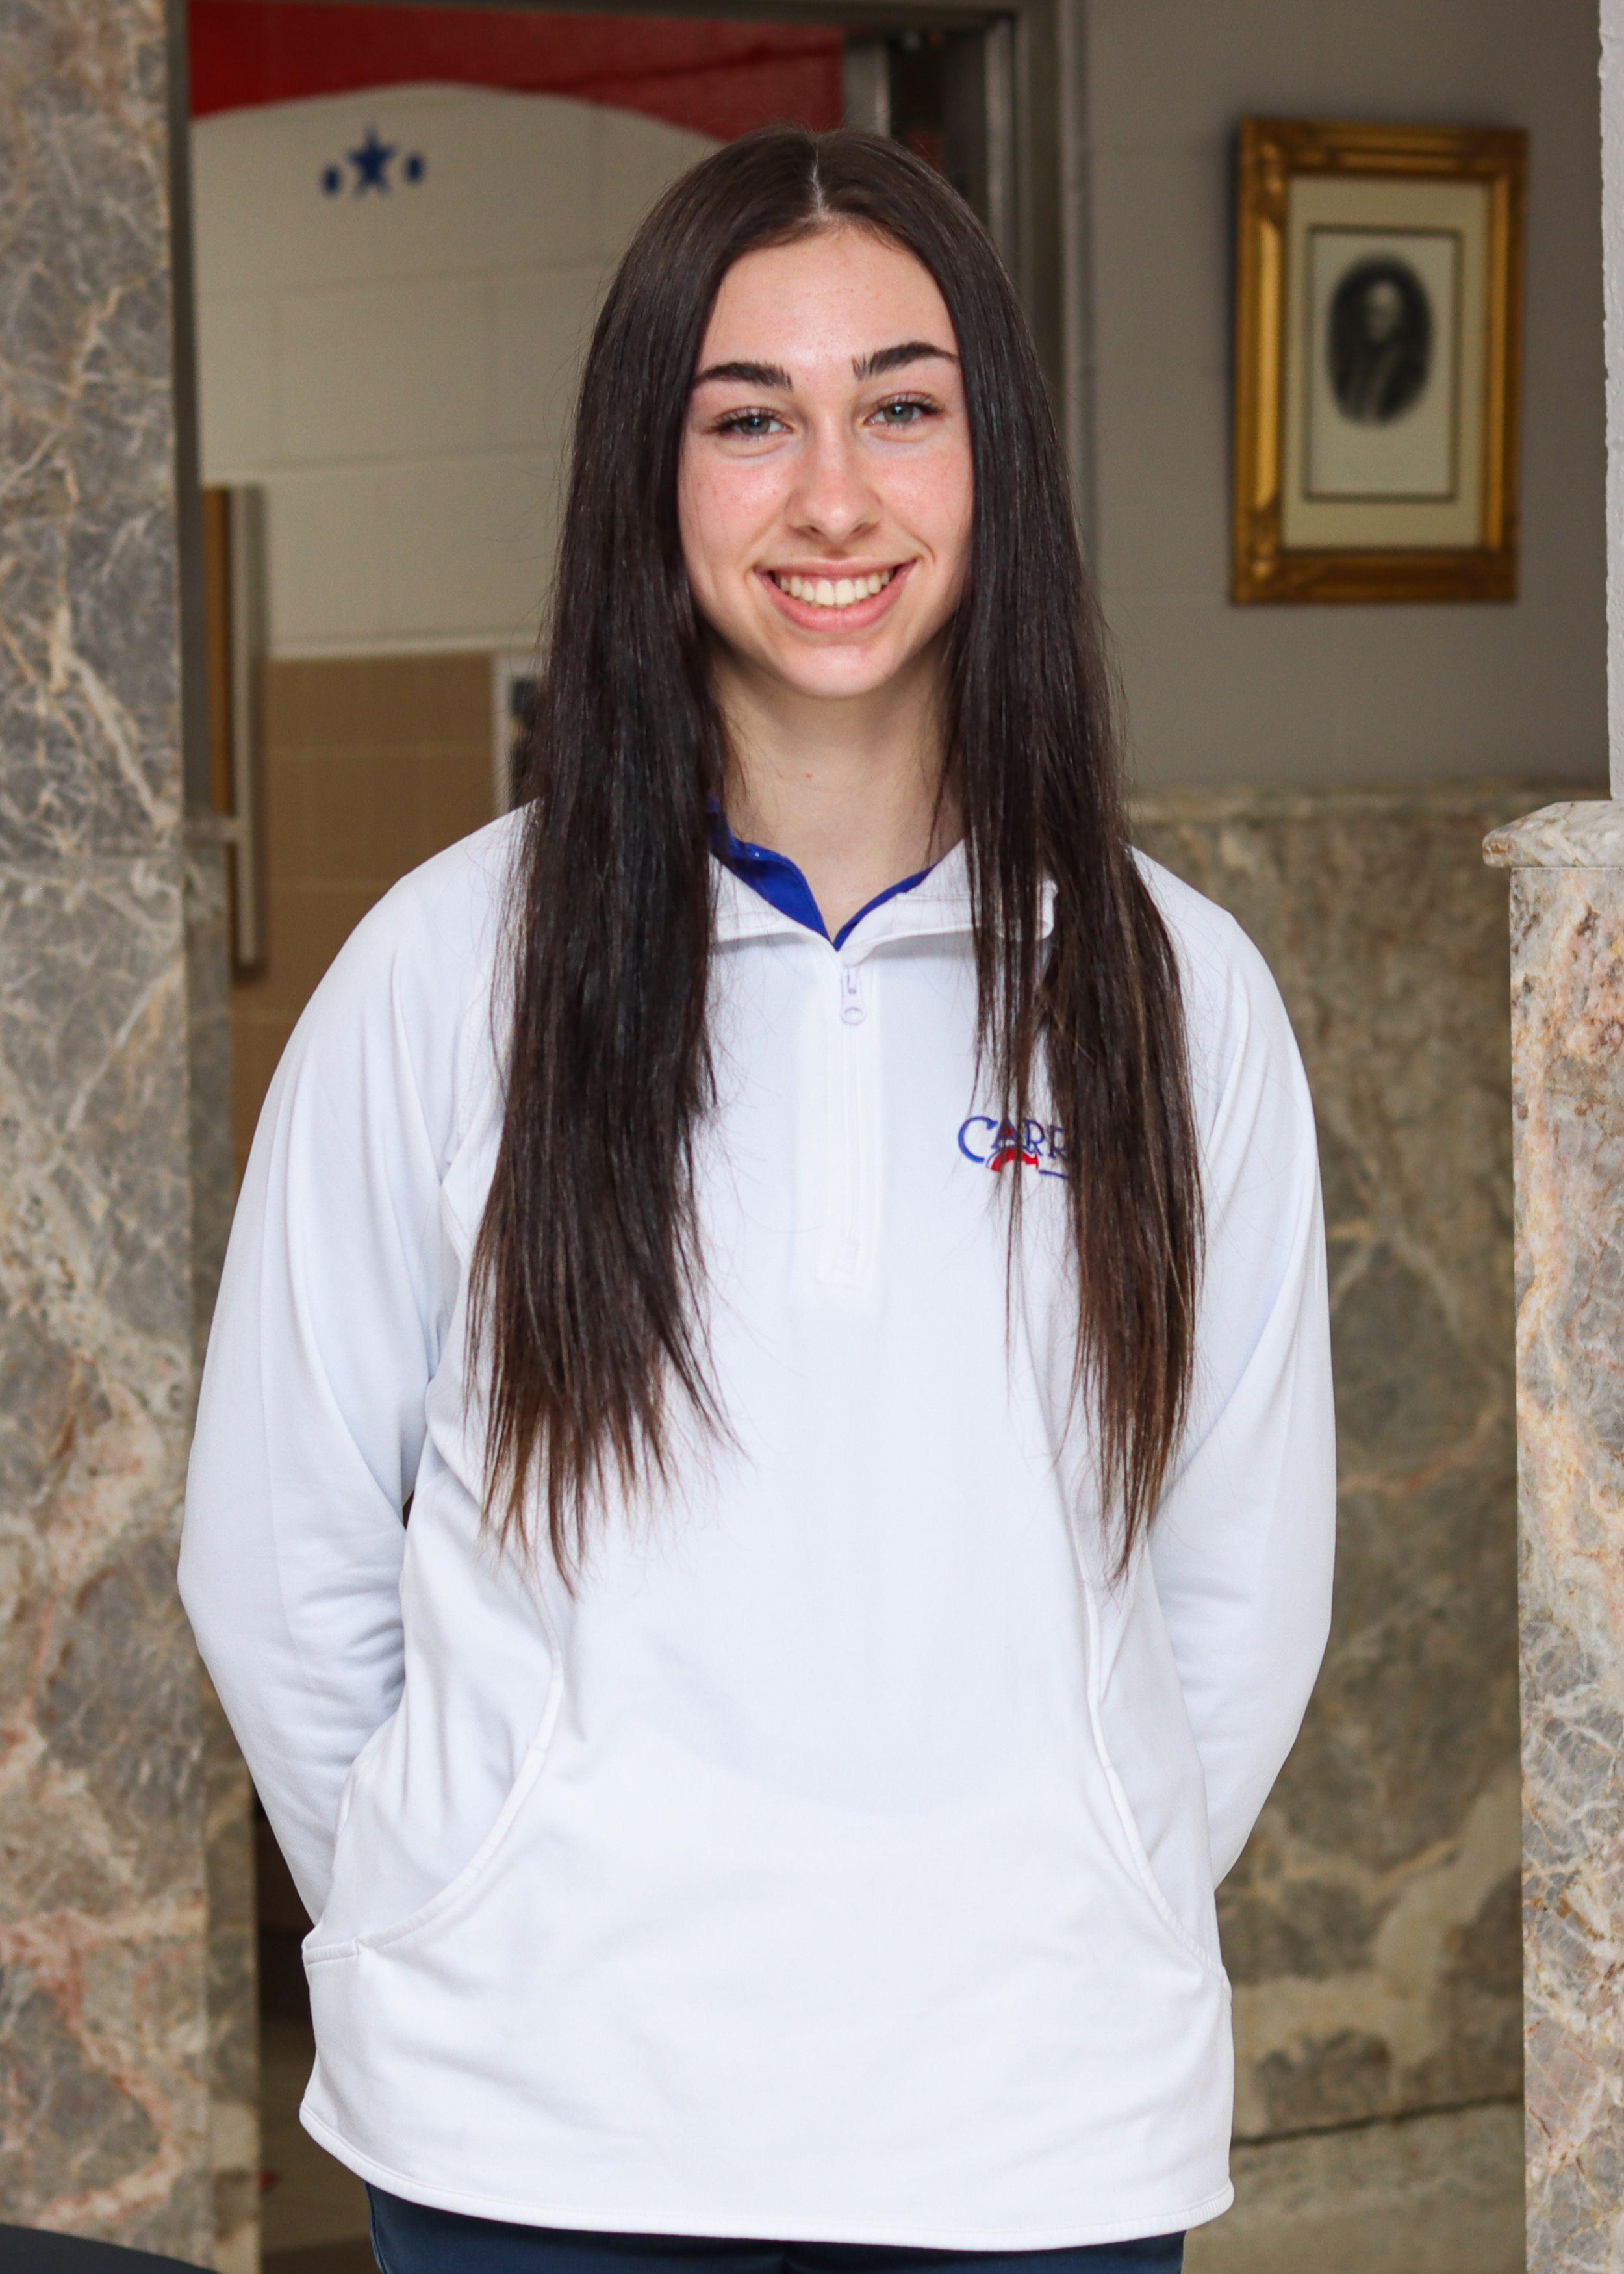 McKenna Lange Leukemia Lymphoma Society Student of the 2021 Canddiate